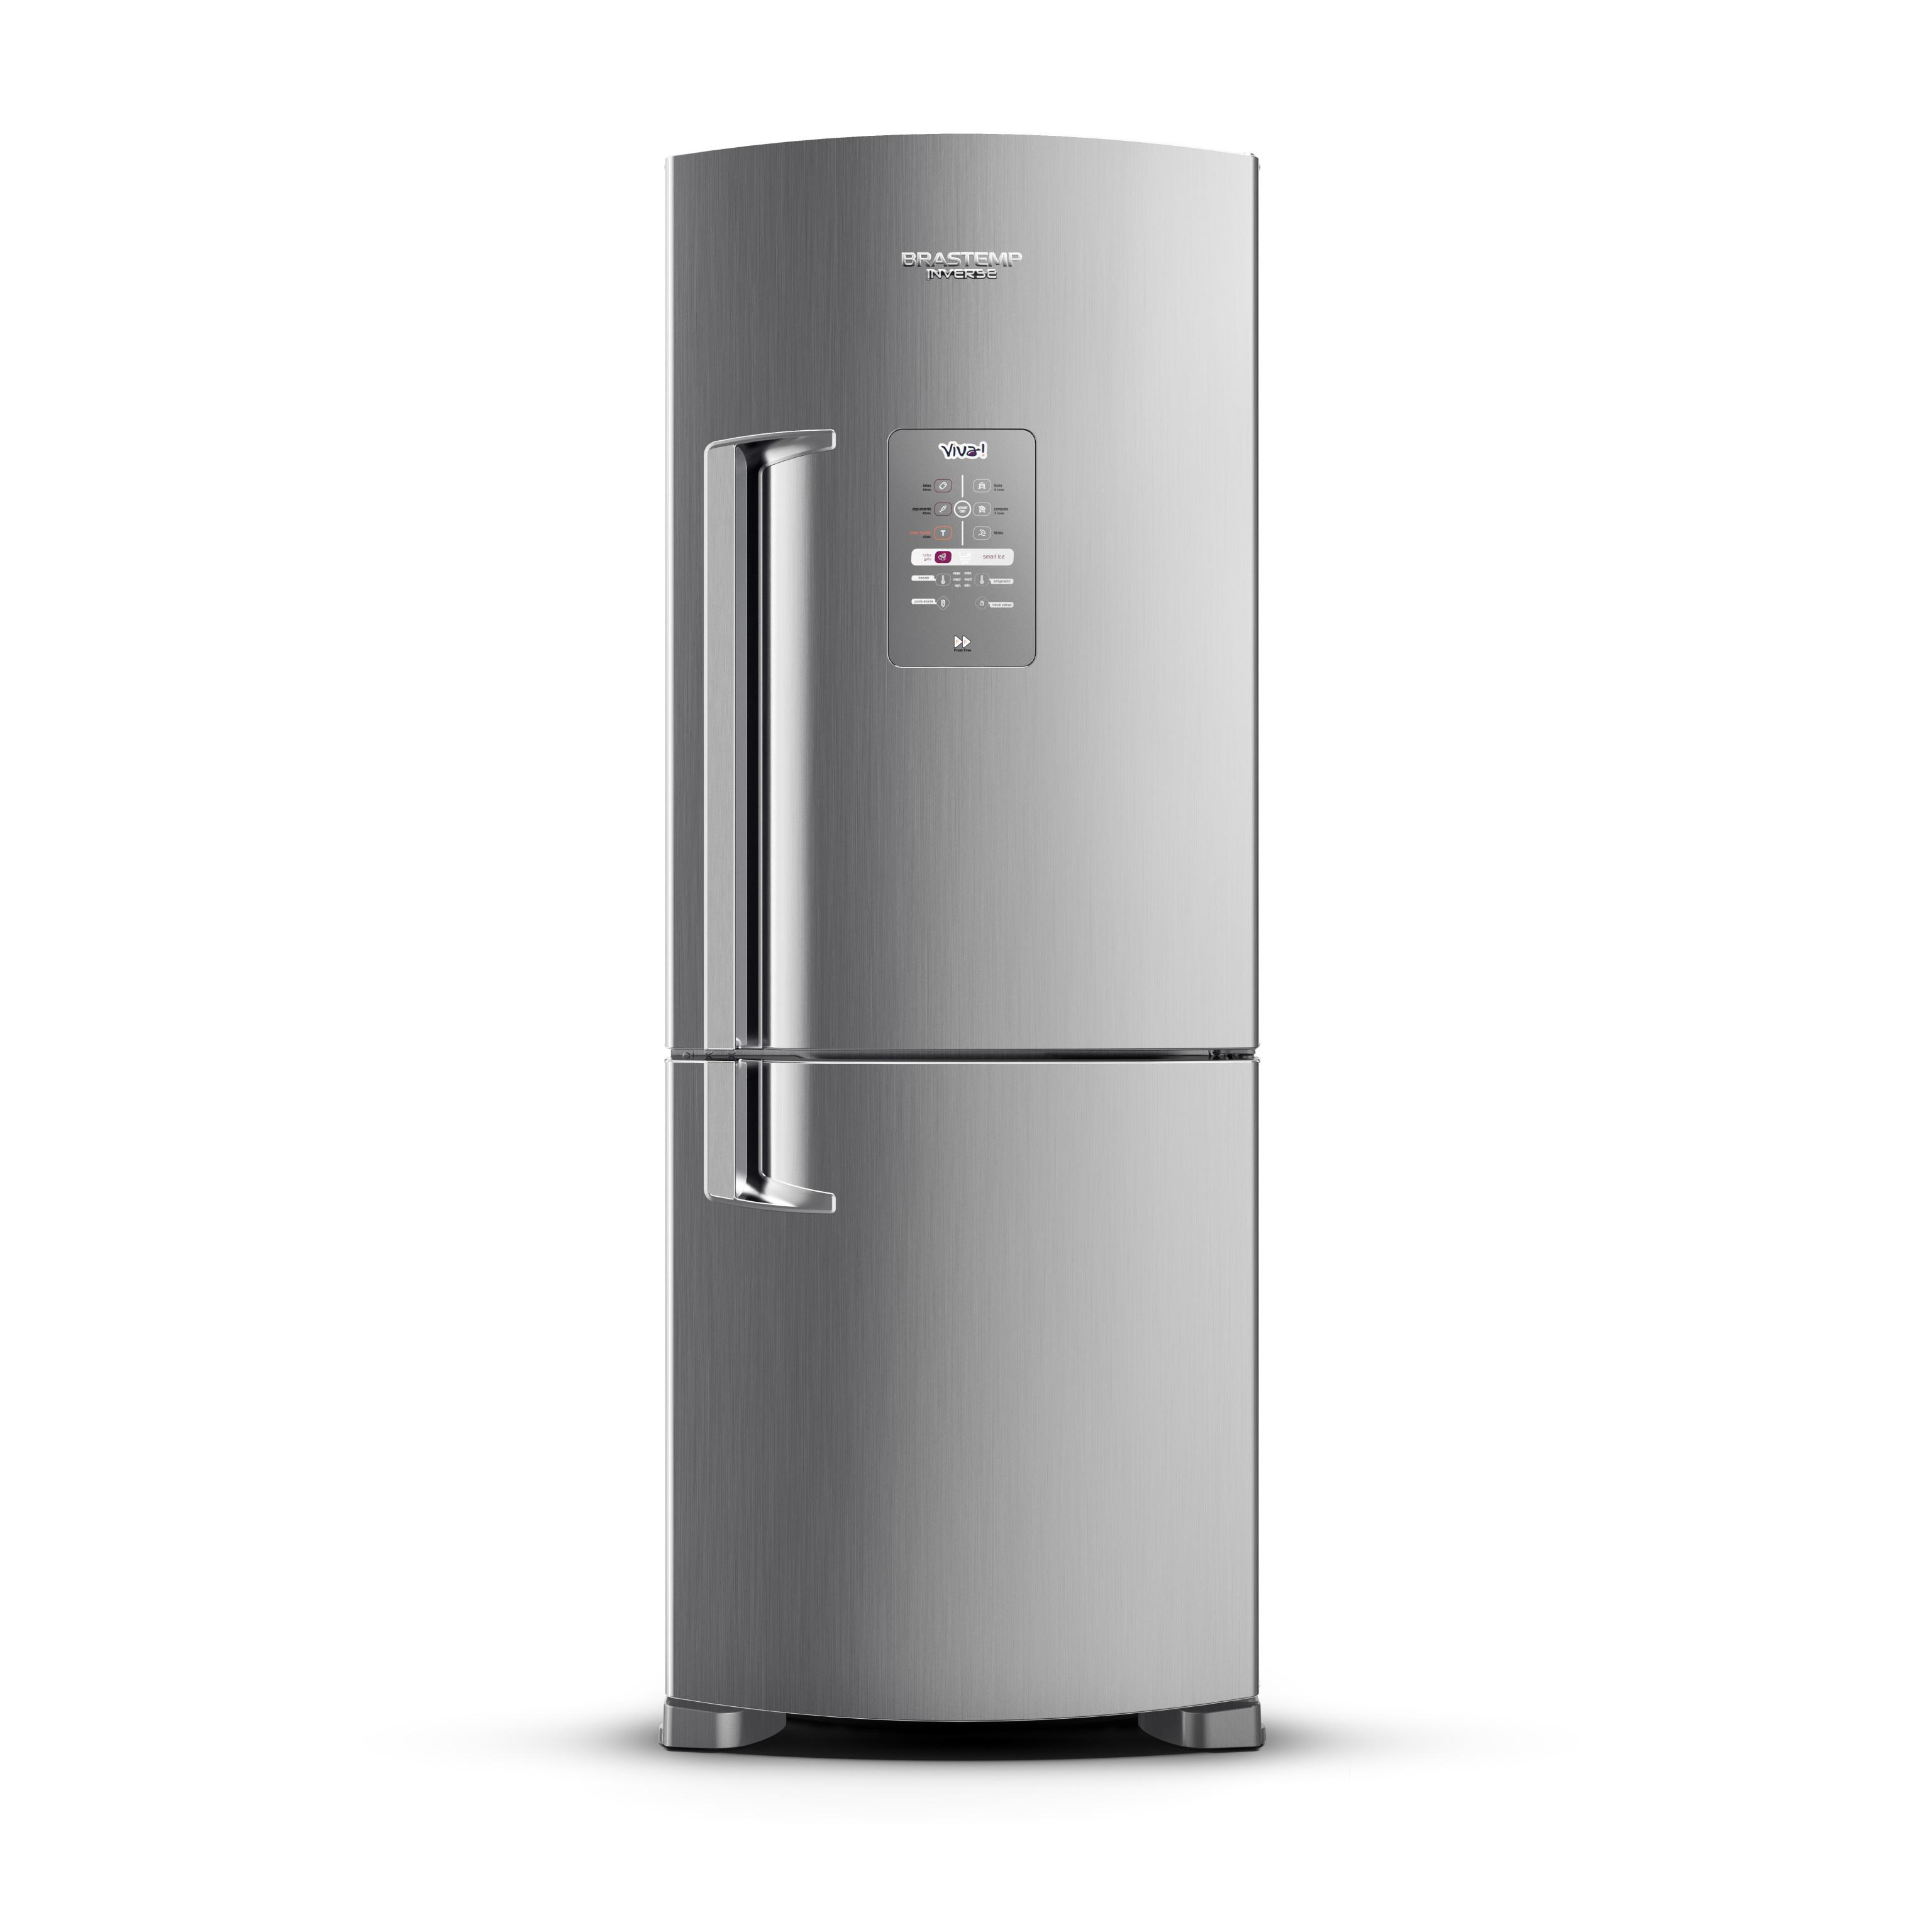 Geladeira Brastemp Frost Free Inverse 422 litros cor Inox Viva com Smart Ice